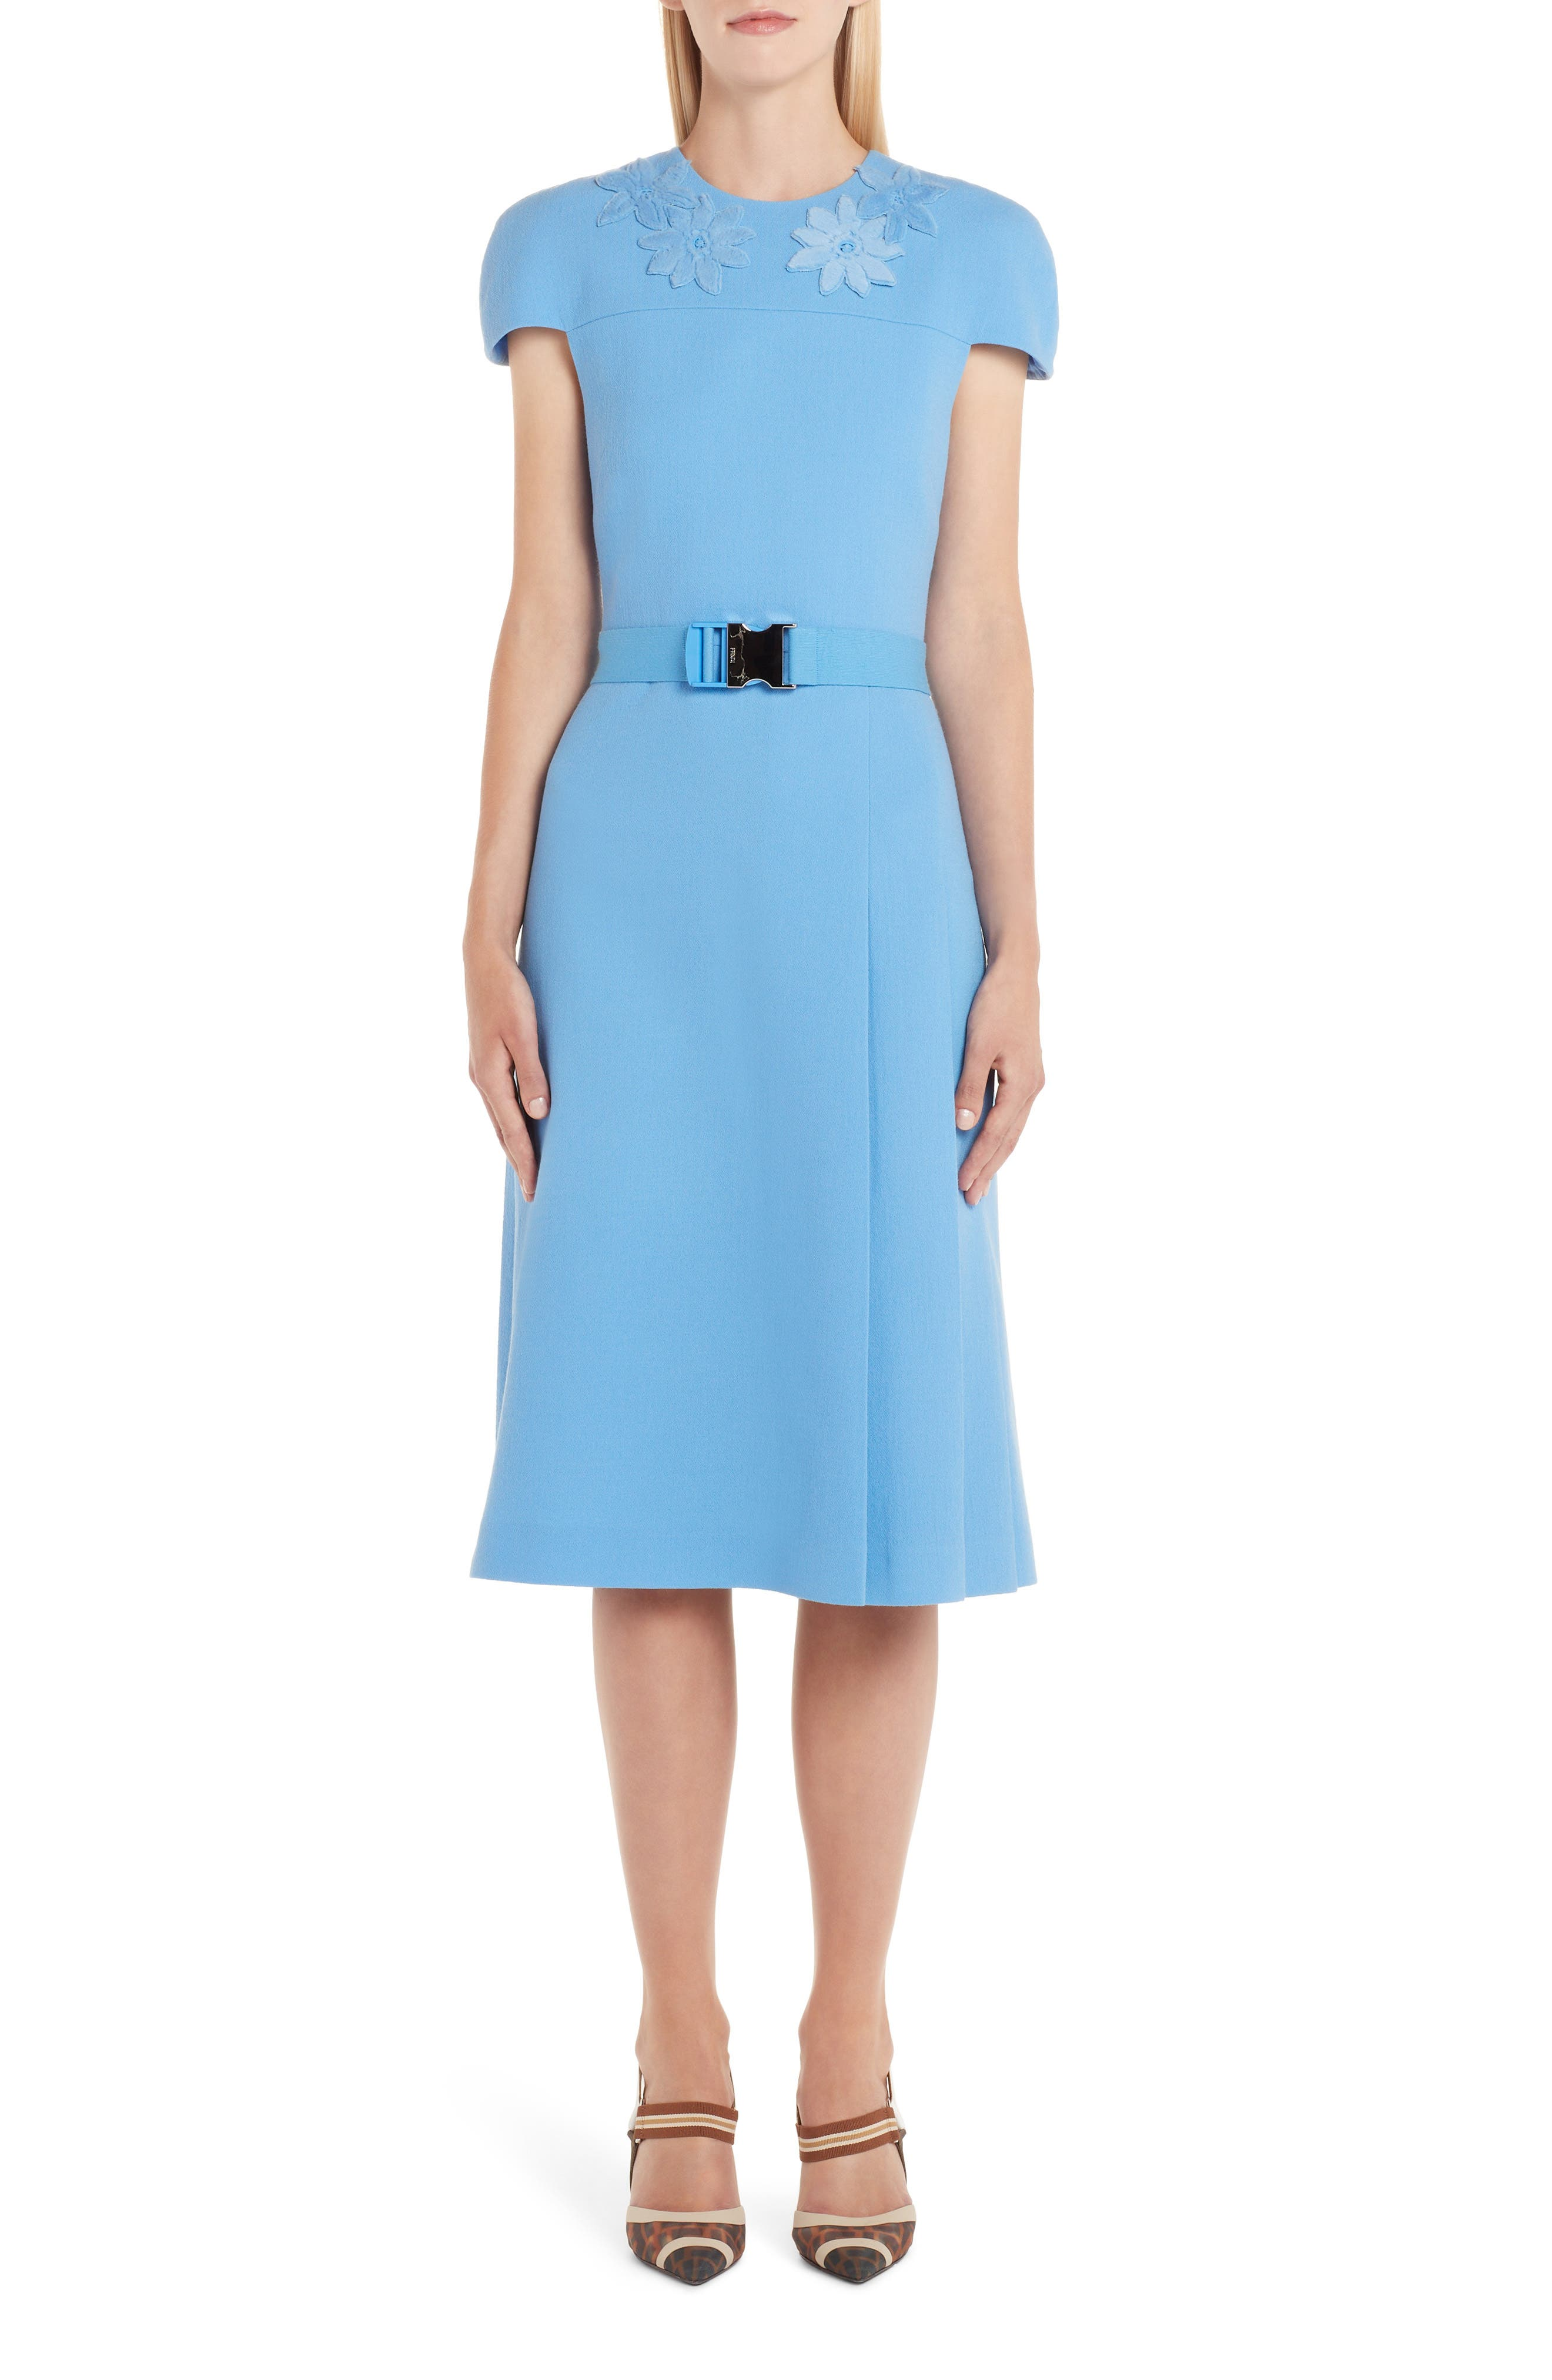 Fendi Genuine Mink Fur Flower Belted Wool Crepe Dress, 50 IT - Blue